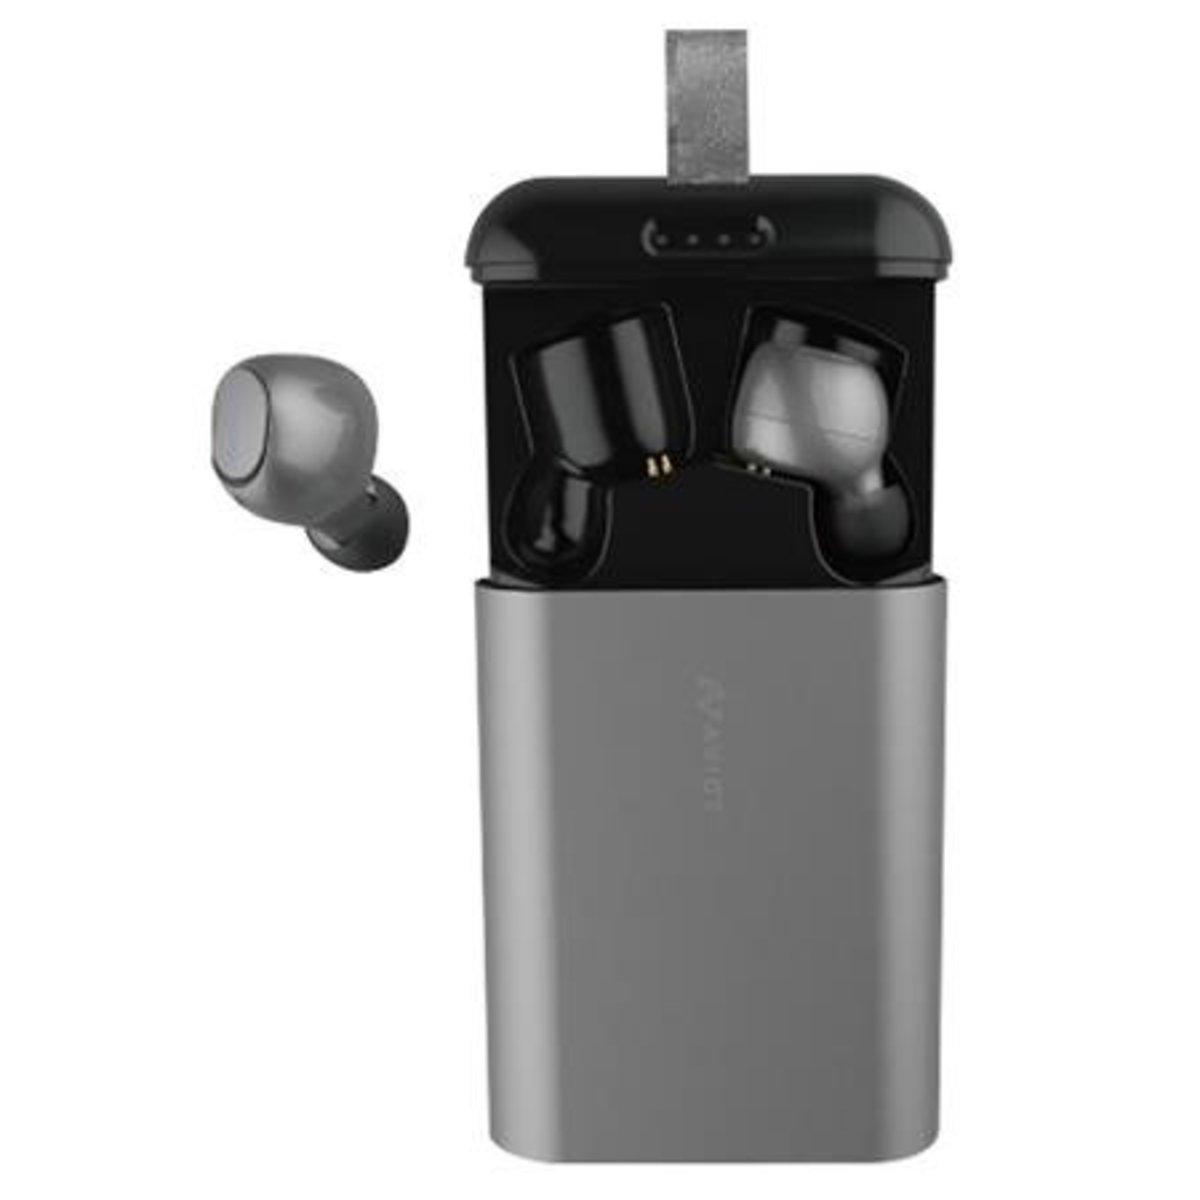 TE-D01b aptX/ AAC True Wireless Earphones[Gun Metal]